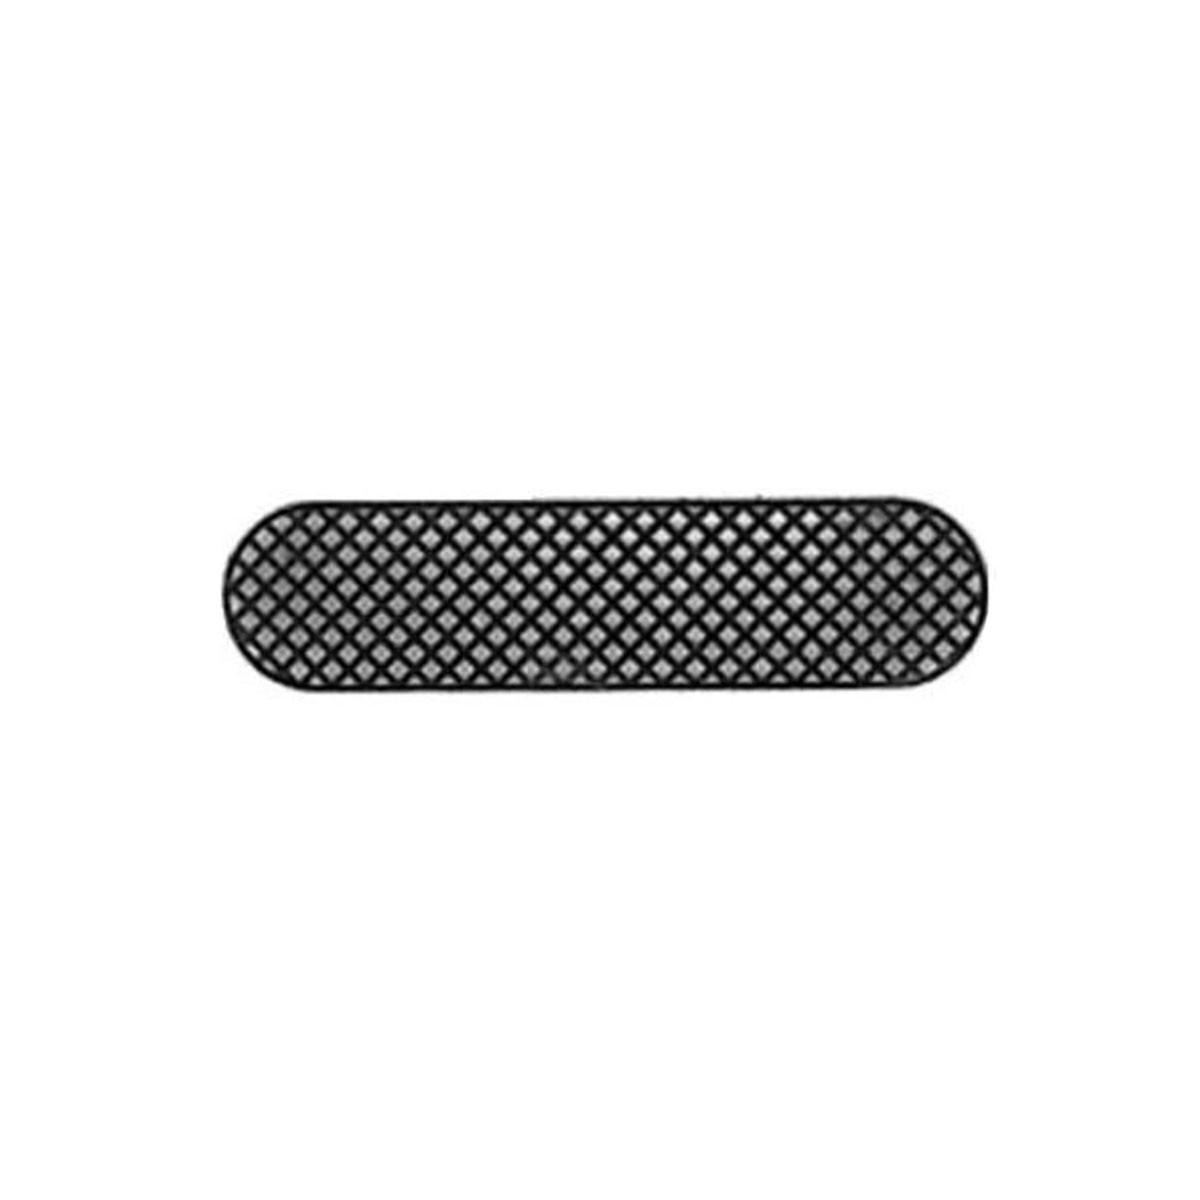 Rejillas guarda polvo de auricular, anti dust para iphone 4 / 3gs/ 3g